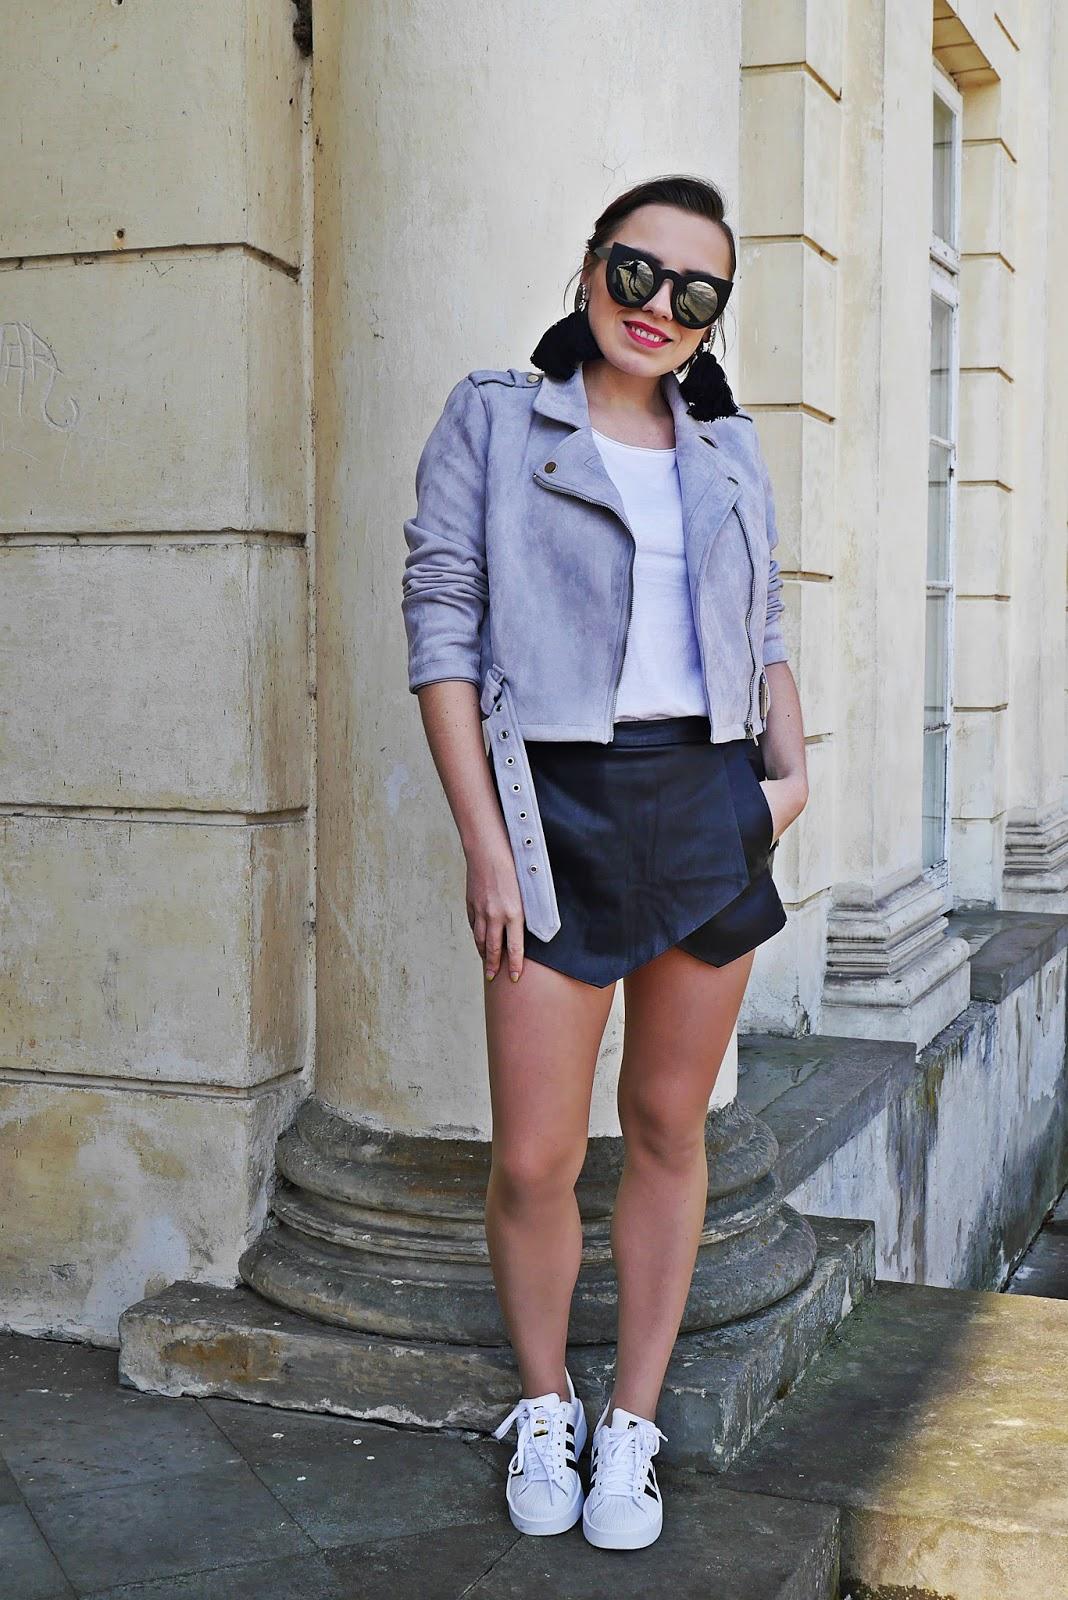 10_pulawy_blog_modowy_blogerka_modowa_karyn_look_250318